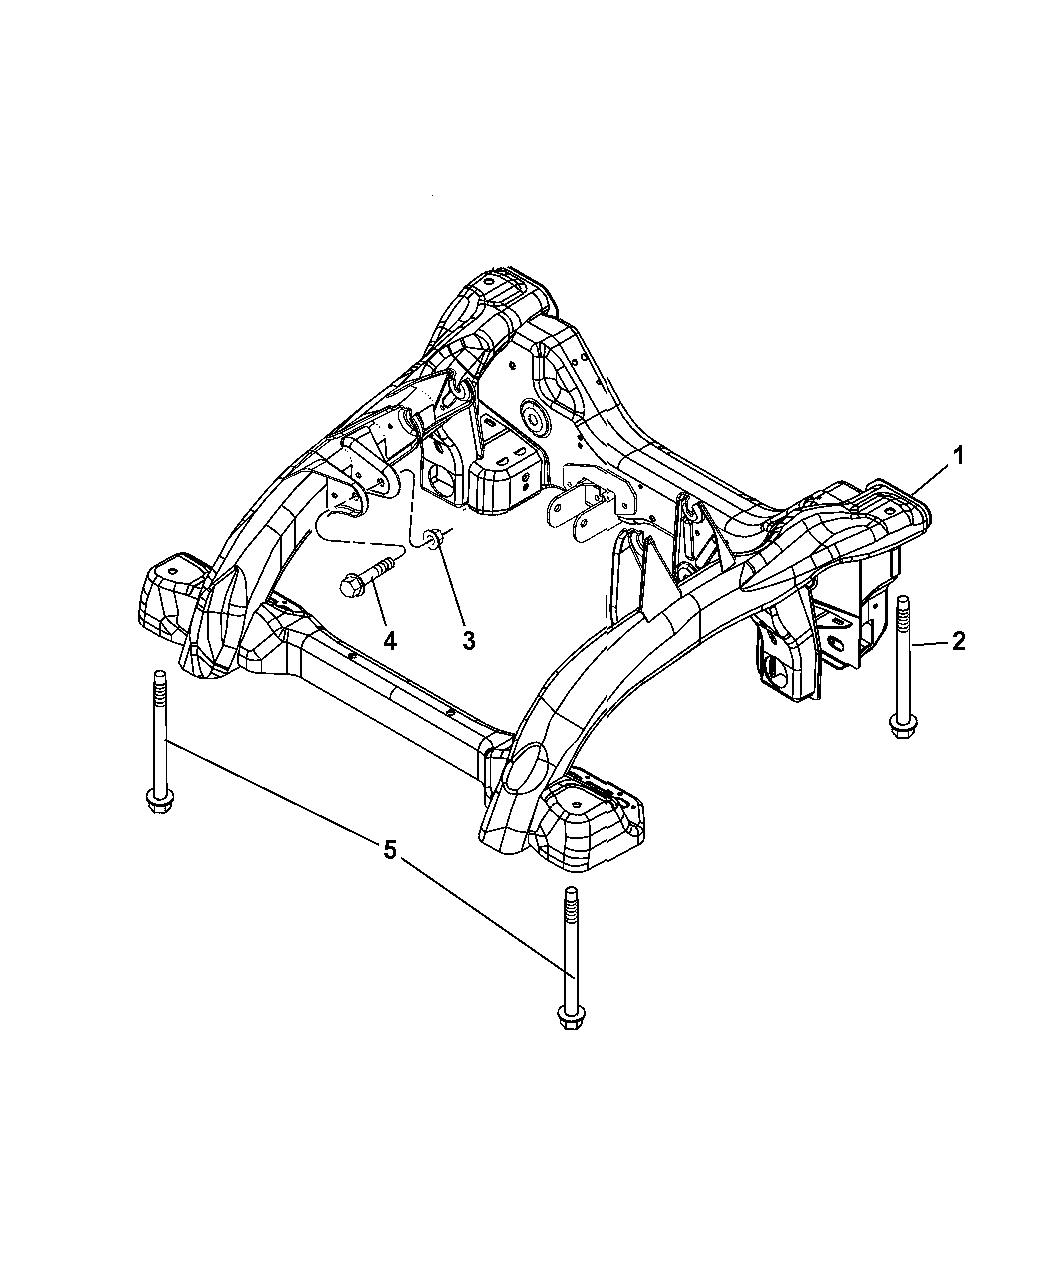 2008 Jeep Grand Cherokee Cradle  Front Suspension